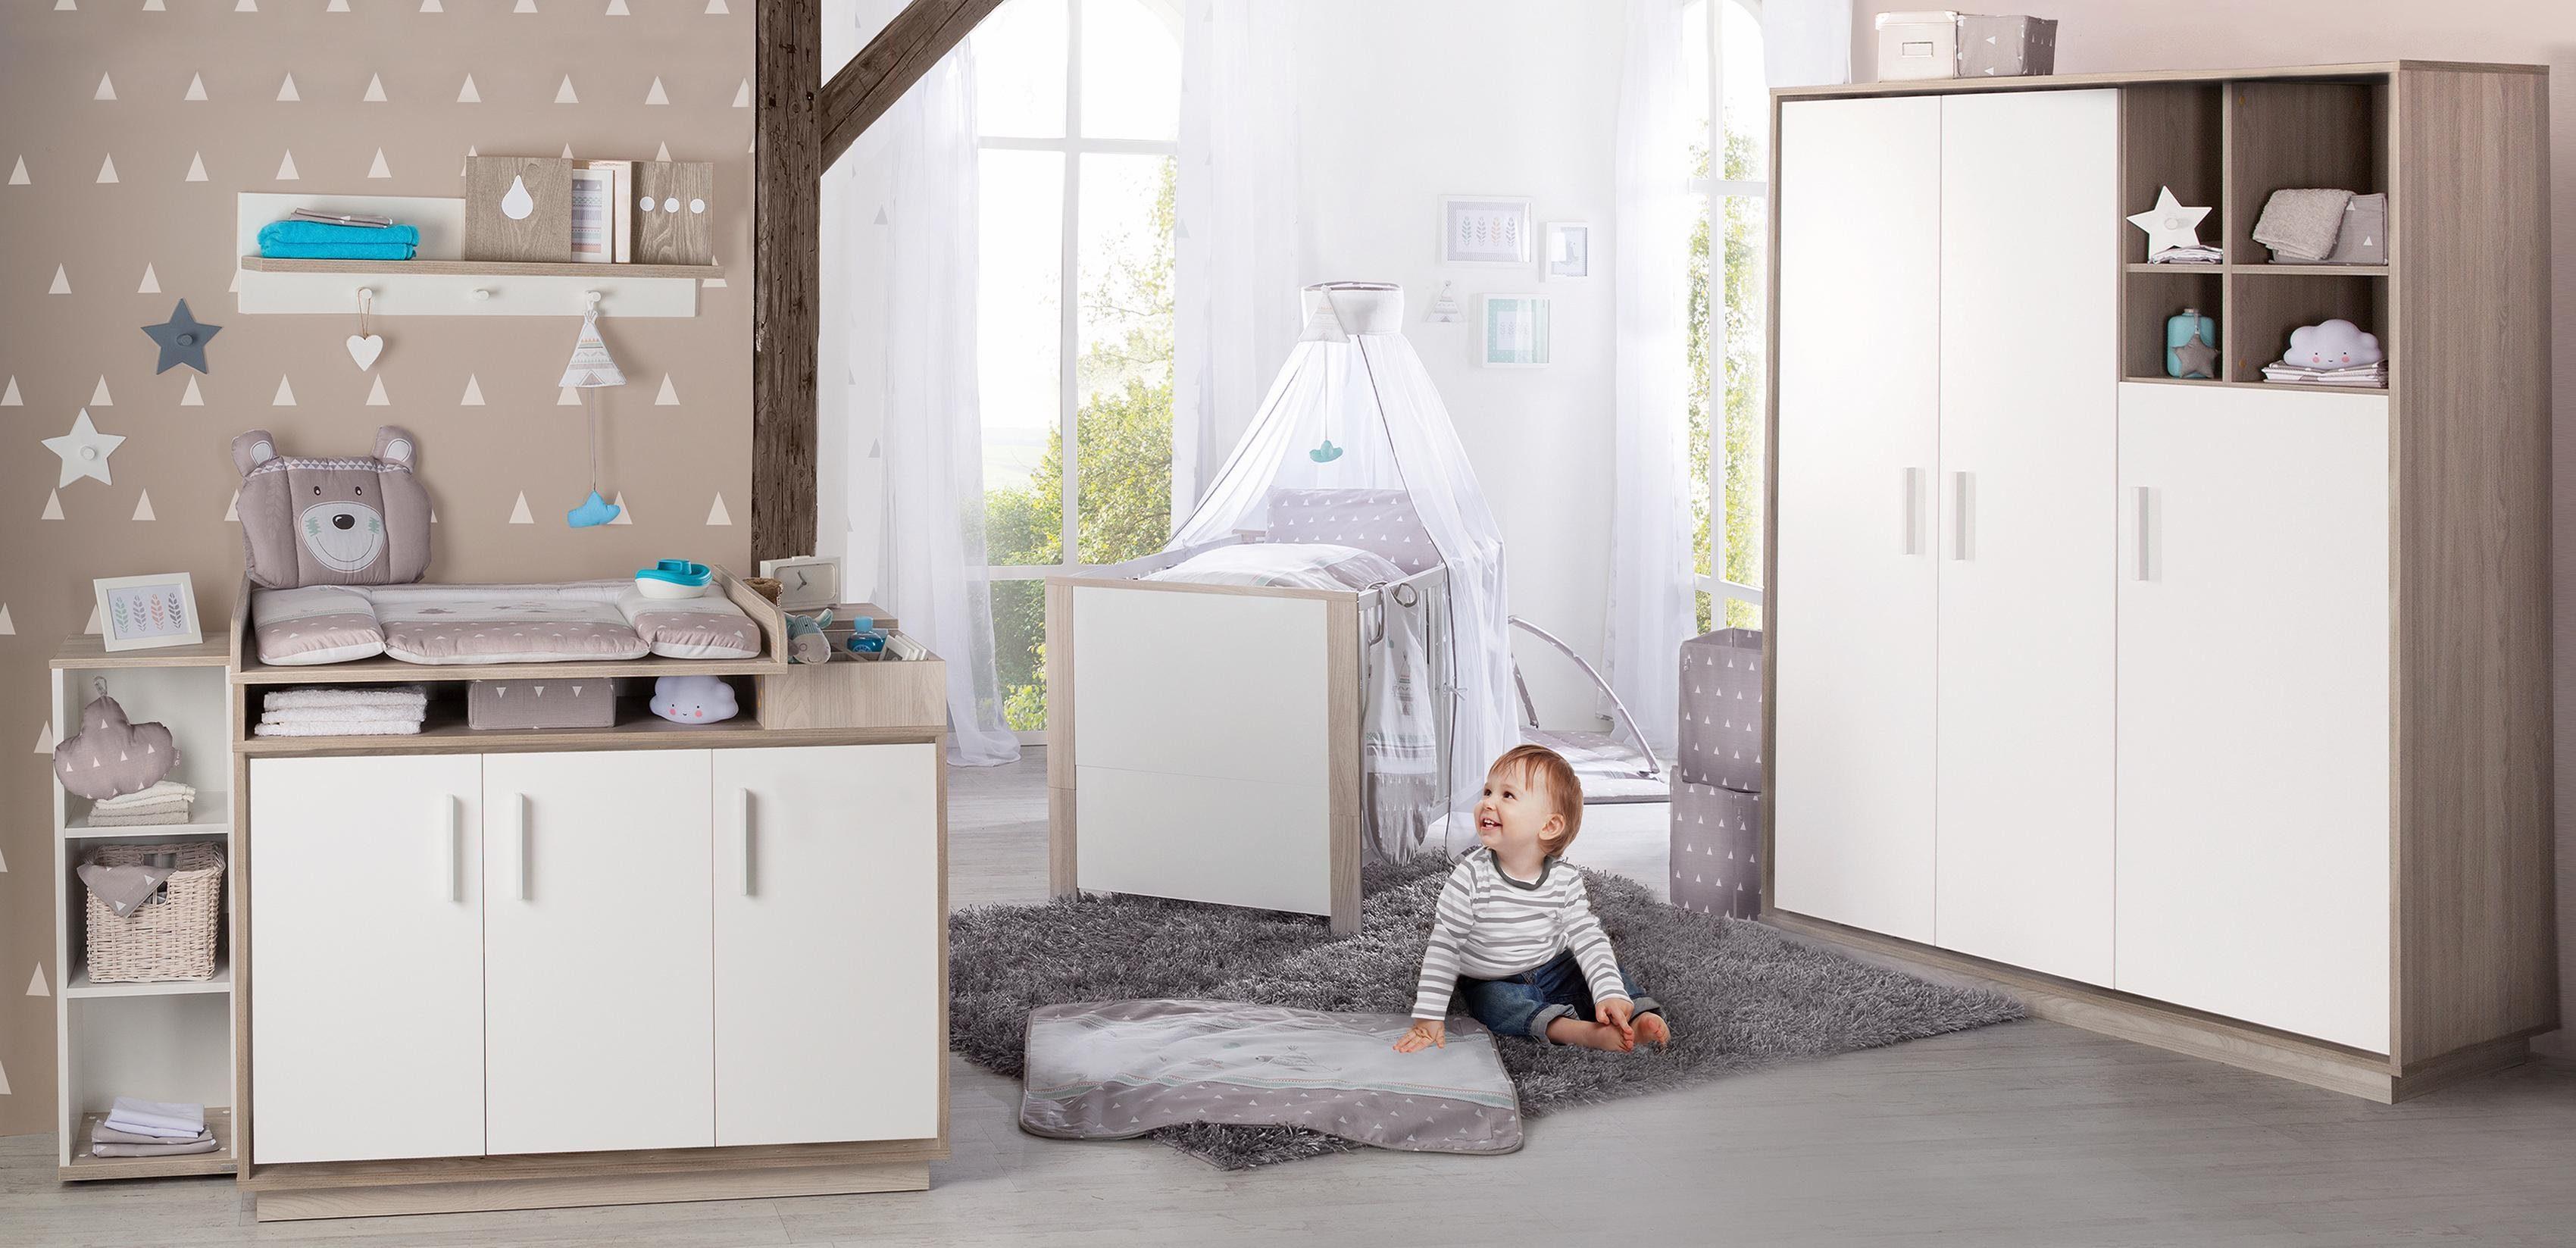 Roba Babyzimmer Set (3-tlg) Kinderzimmer »Olaf«